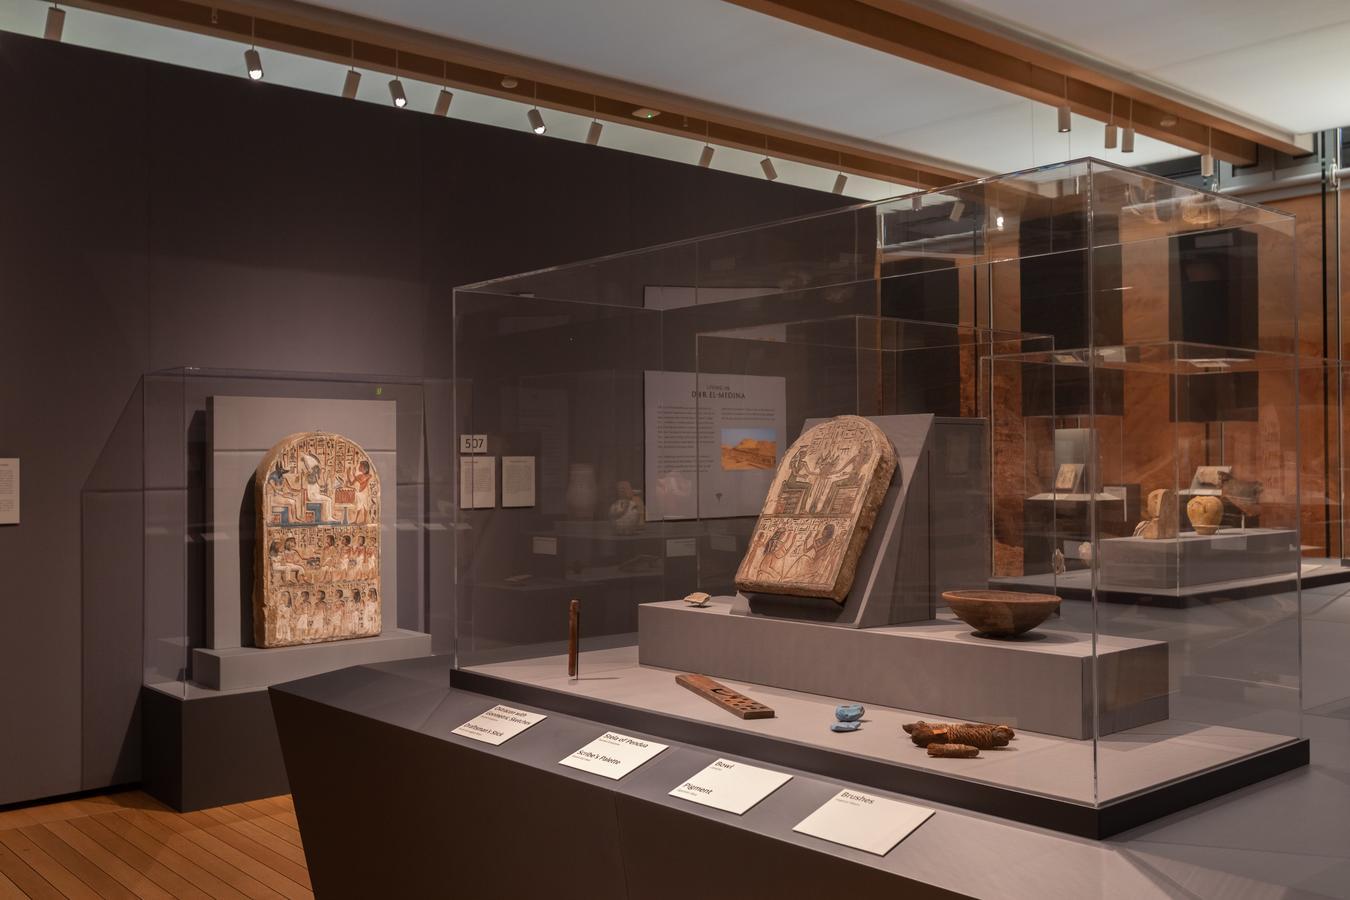 """Queen Nefertari's Egypt"" installation, Robert LaPrelle, Kimbell Art Museum"